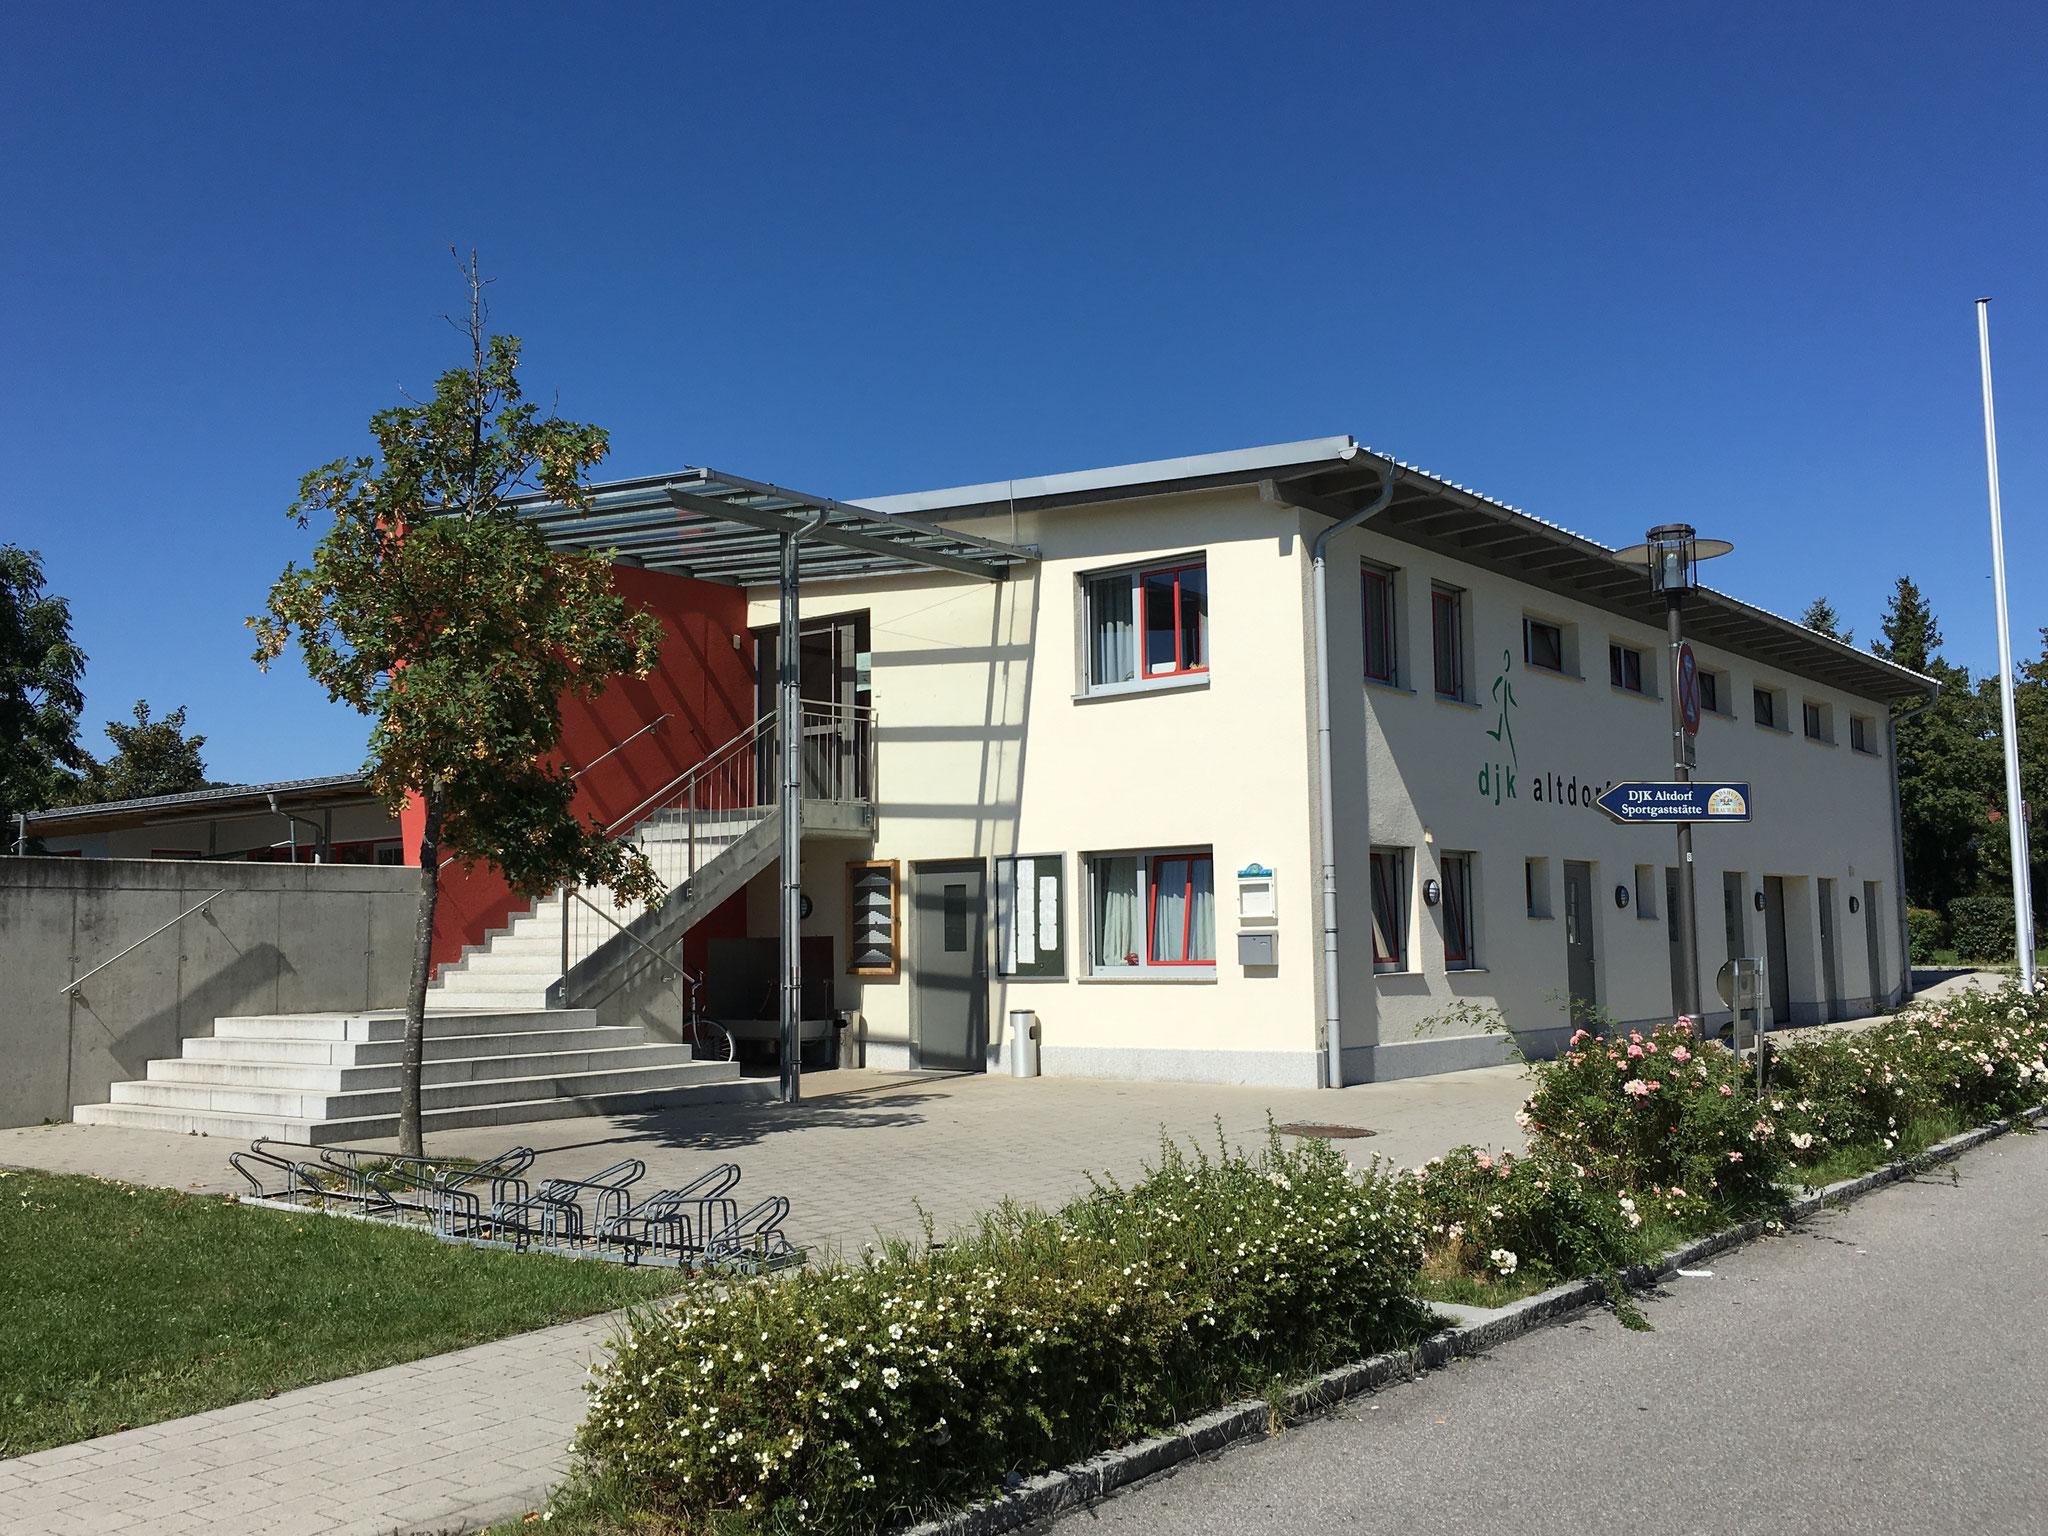 Neubau Vereinsgebäude, Altdorf 2008